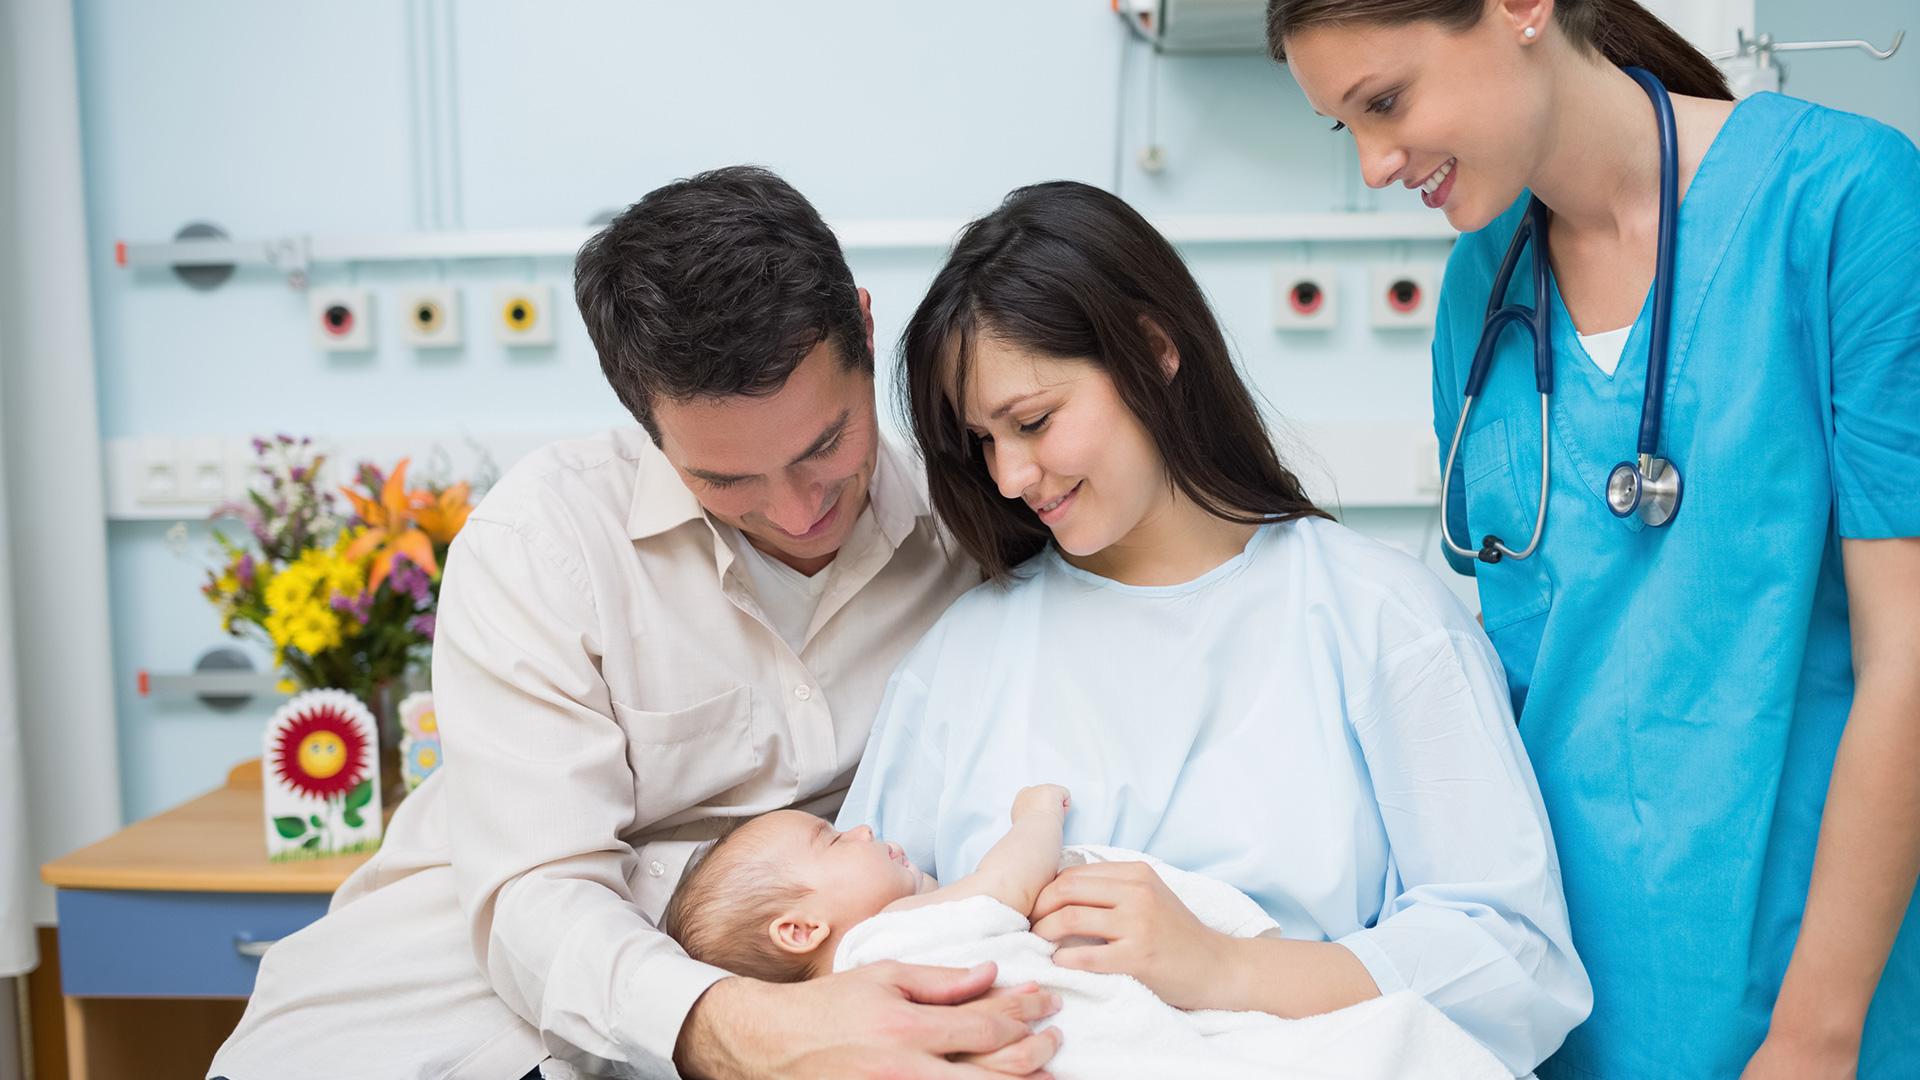 Midwifery and Women Health Photo